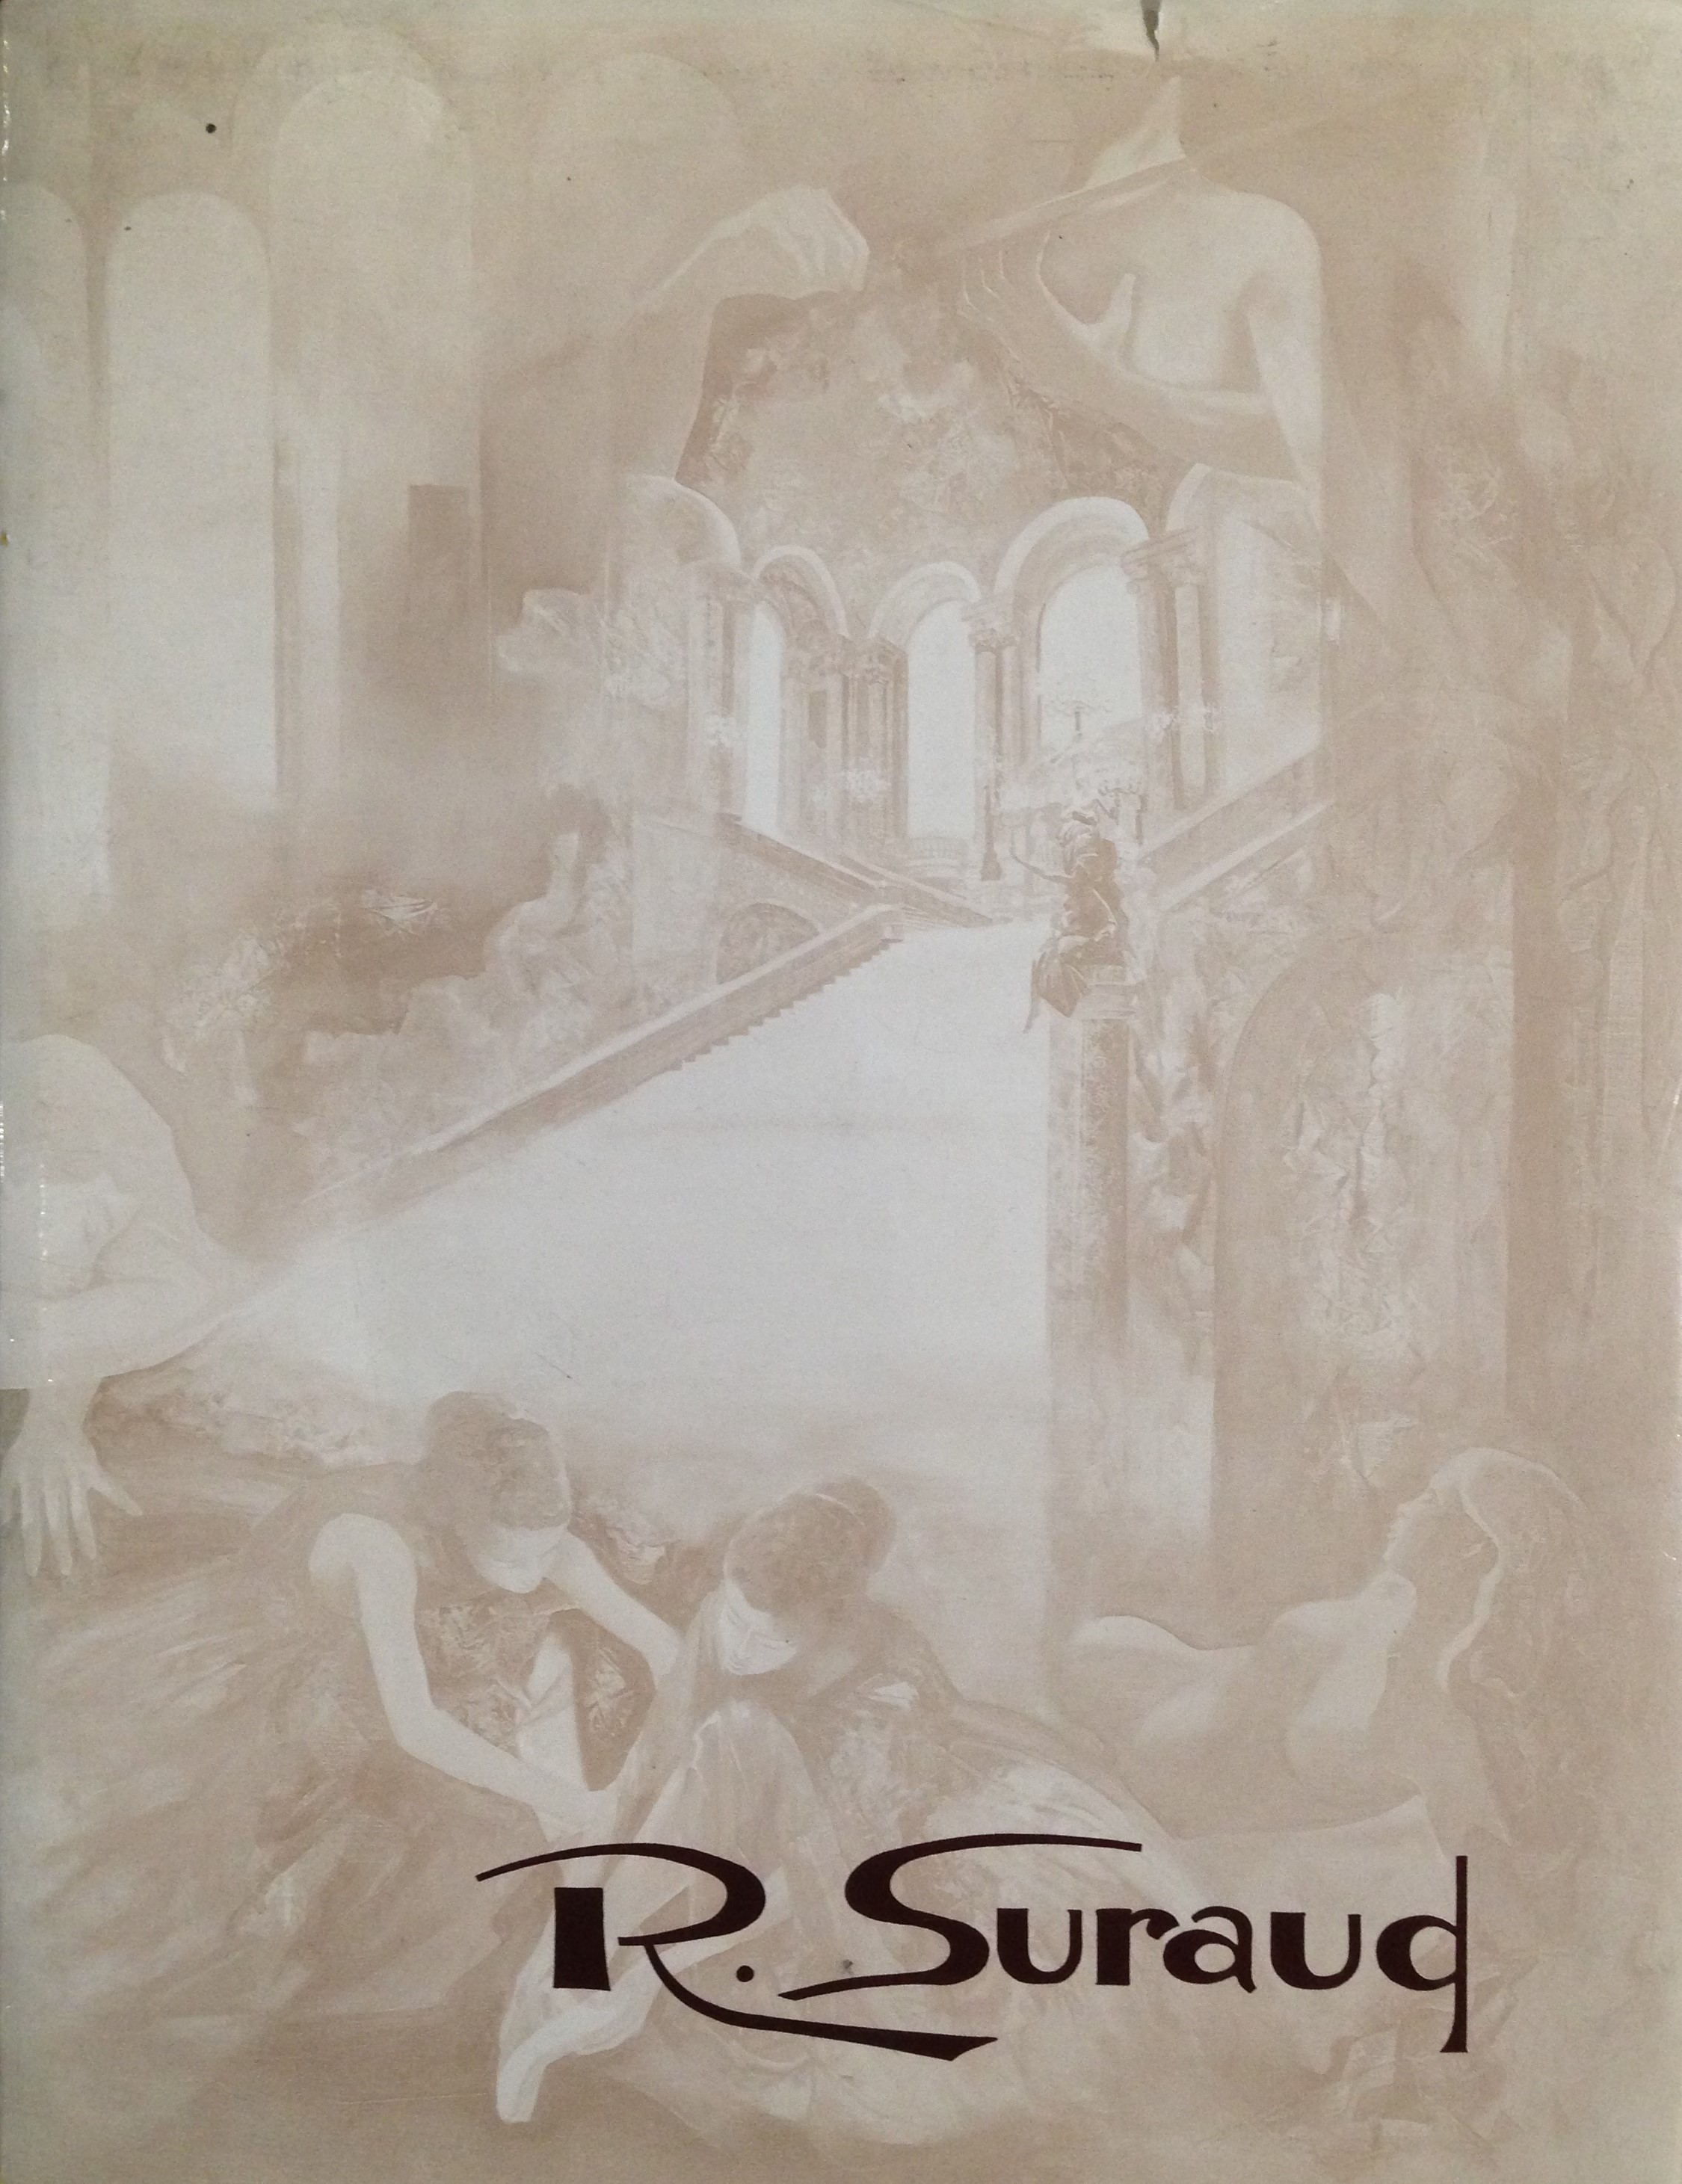 Roger Suraud